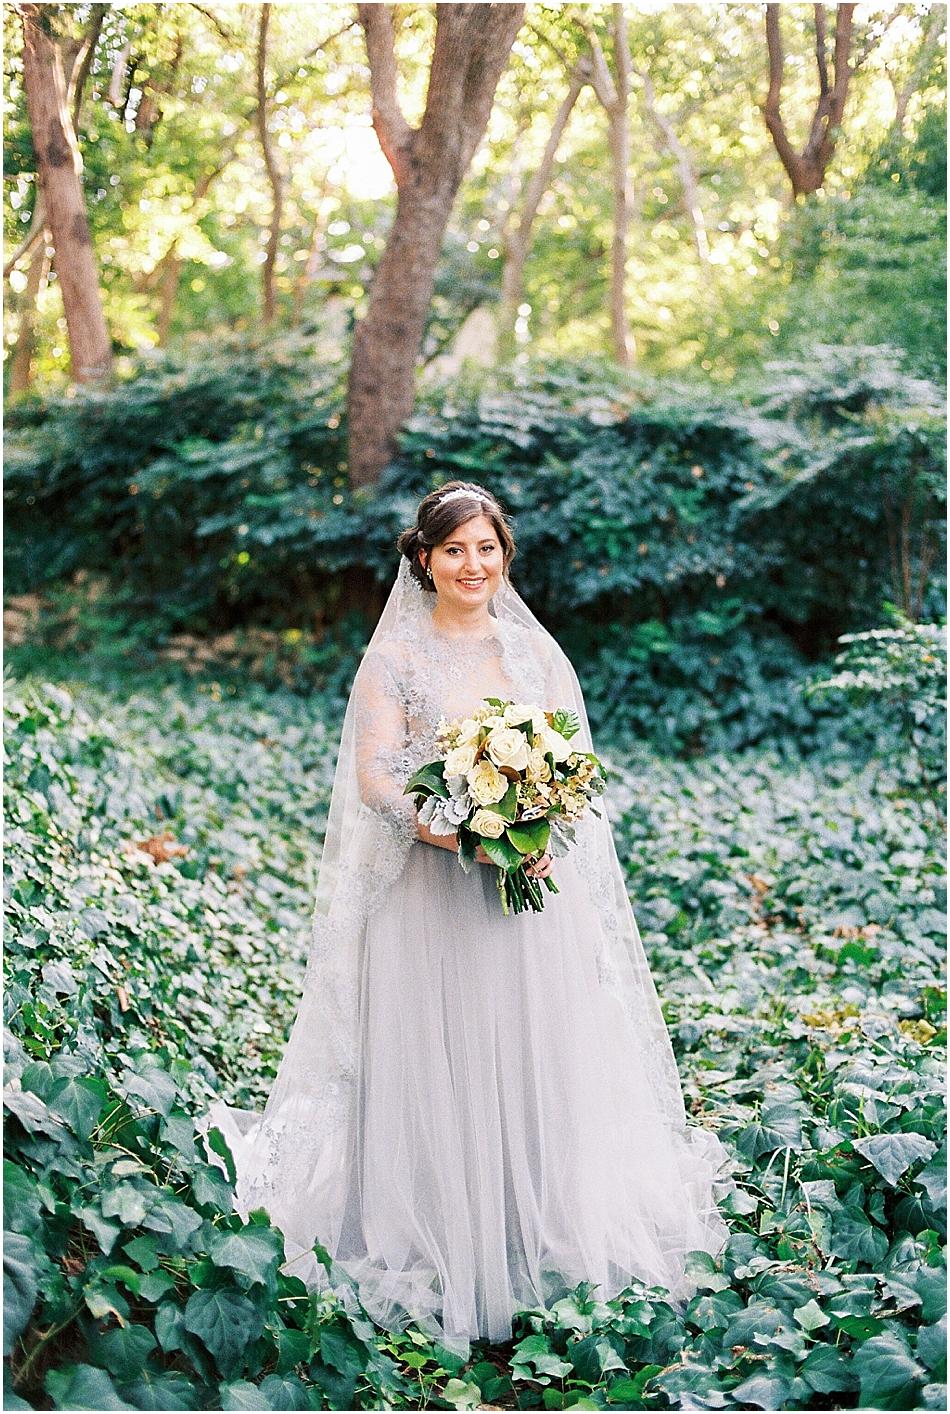 Chandler Bridal   Dallas Bride   Film   Brides of North Texas   Emilie Anne Photography   Dallas Photographer-17.jpg